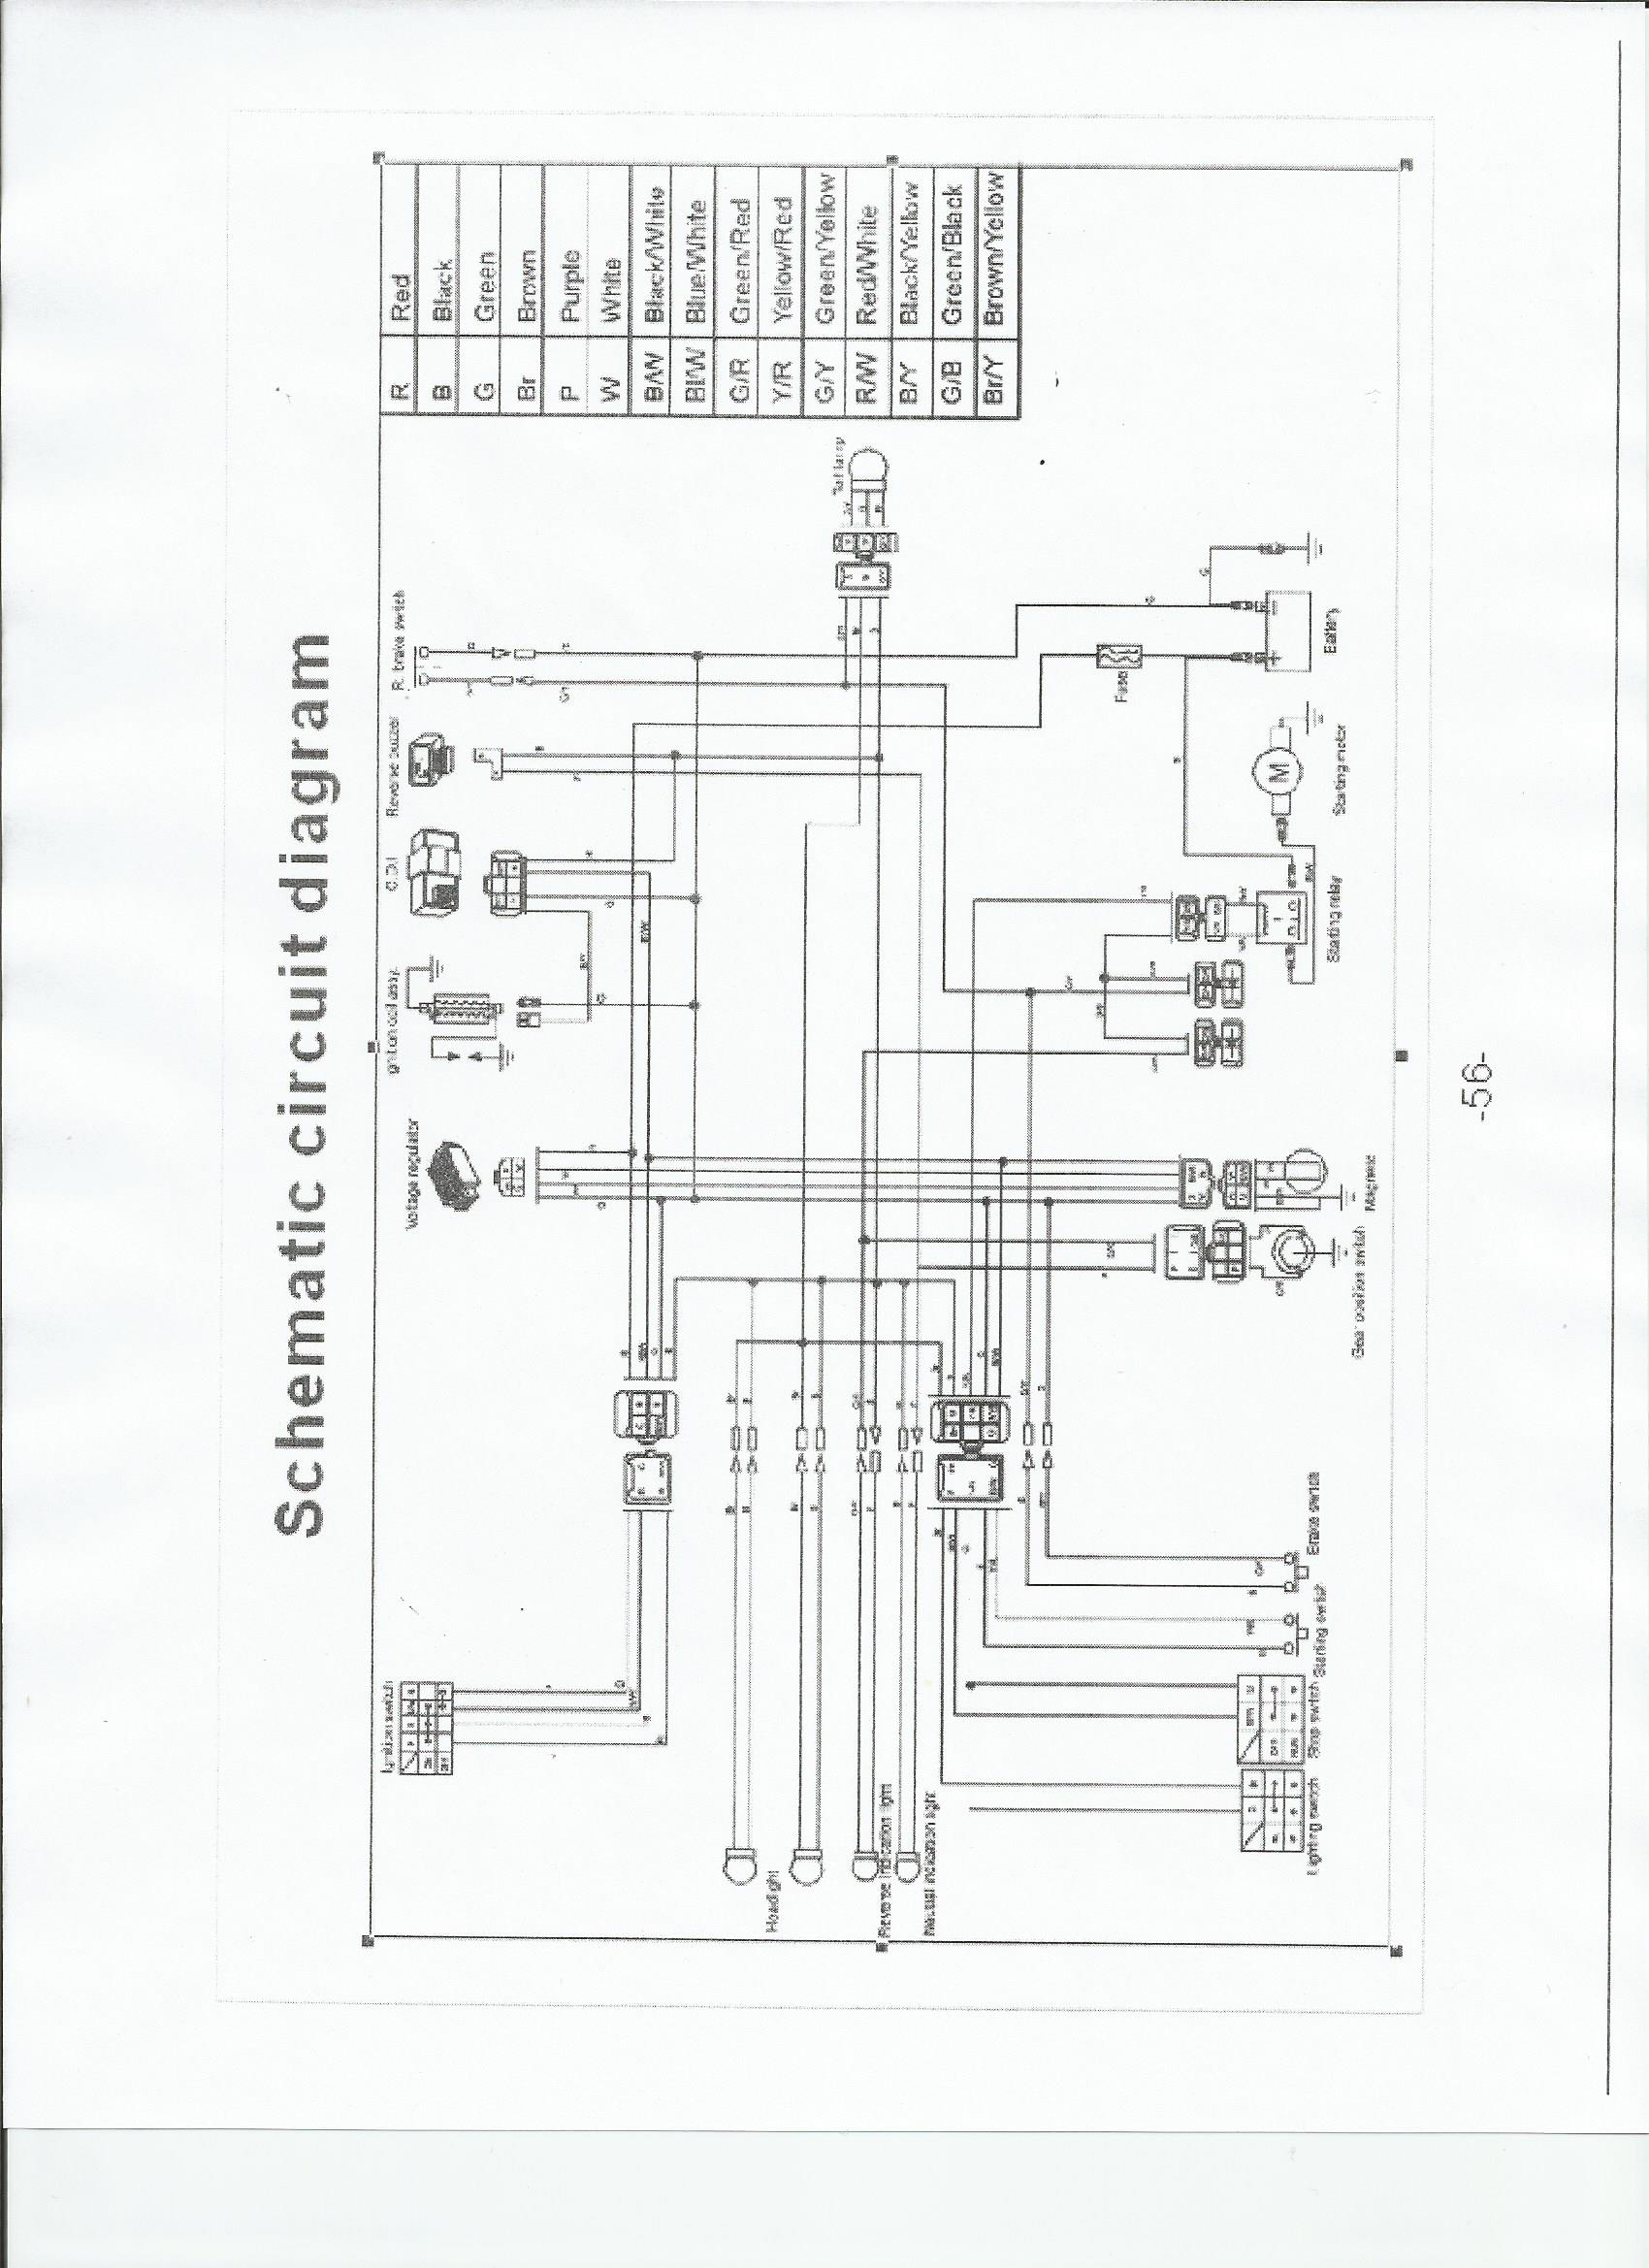 Atv Wiring Diagrams Wd Rok200 Roketa Atv 200 Wiring Diagram